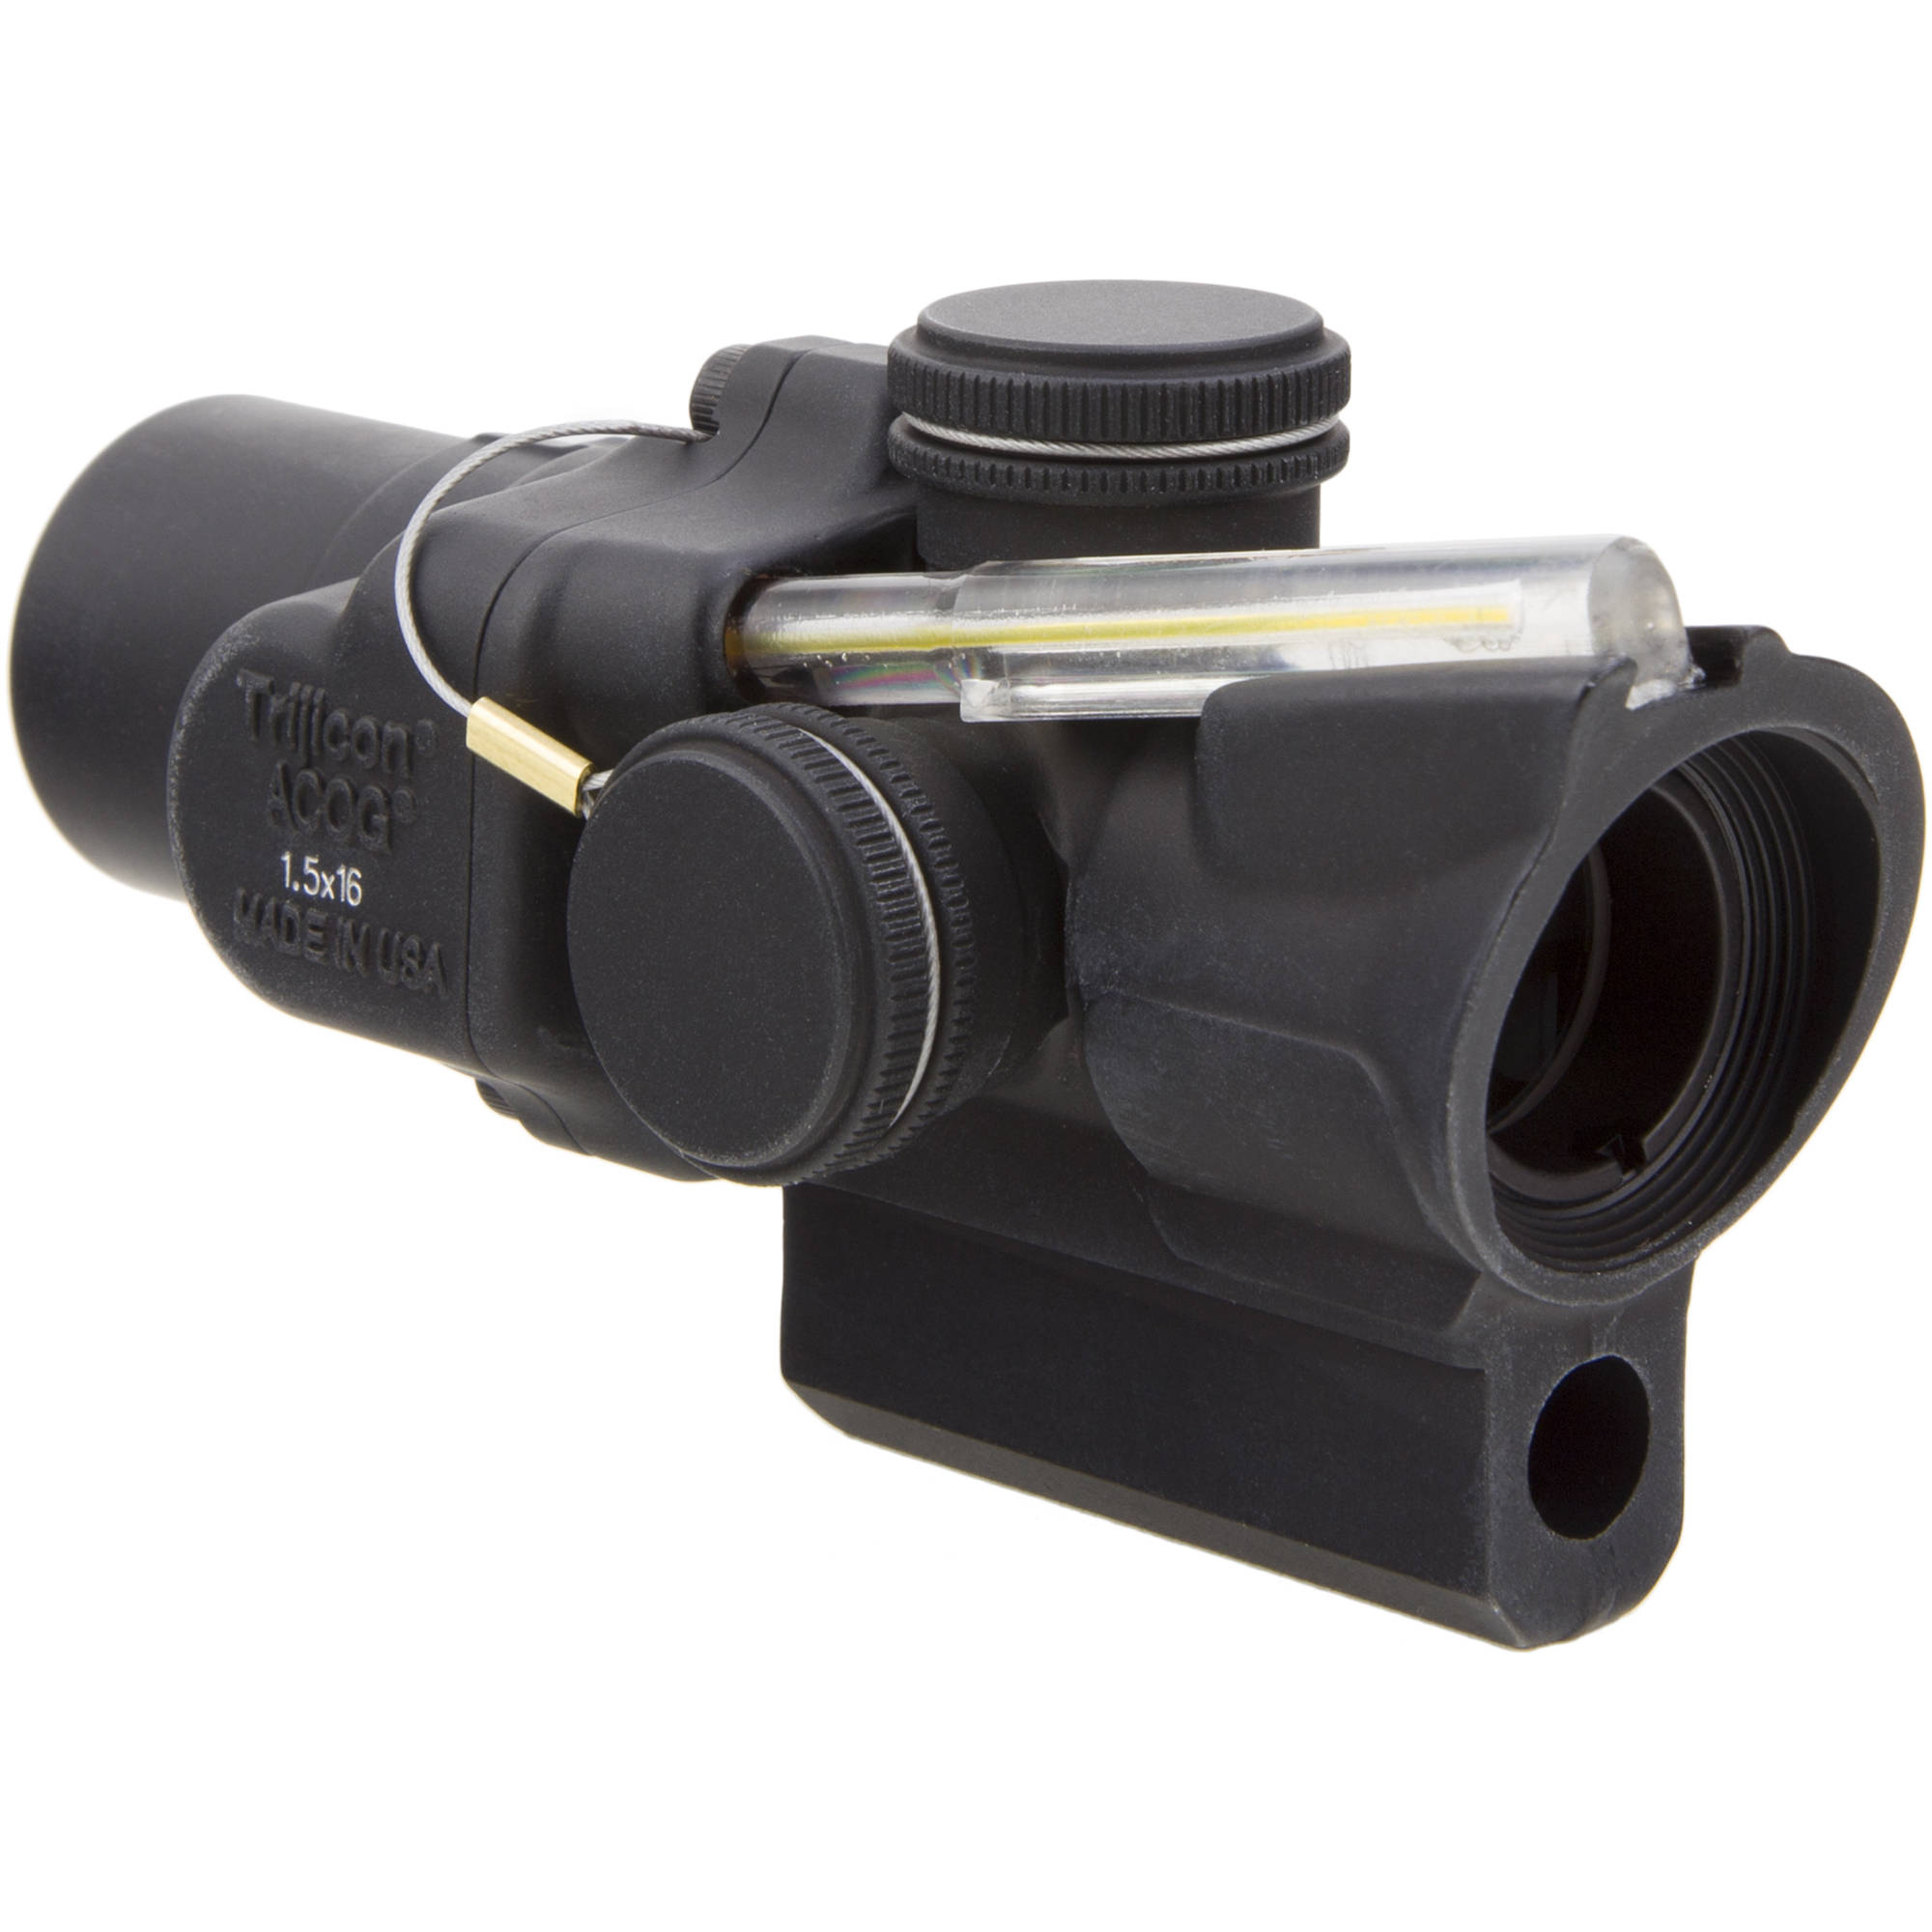 Trijicon 1.5x16S TA44-C ACOG Riflescope TA44-C-400138 B&H ... M16 Acog